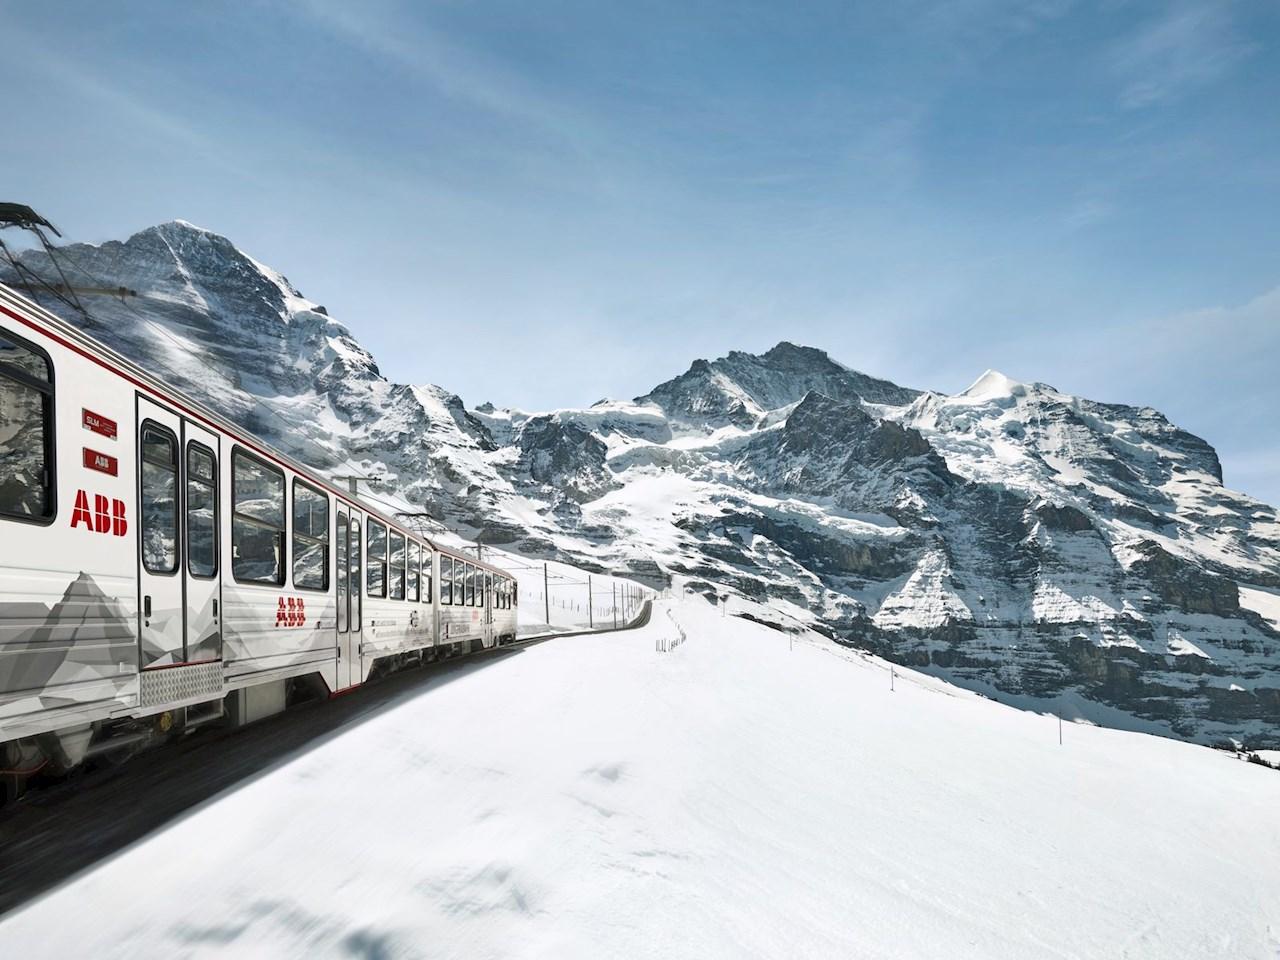 Jungfrau Railway in the Swiss Alps